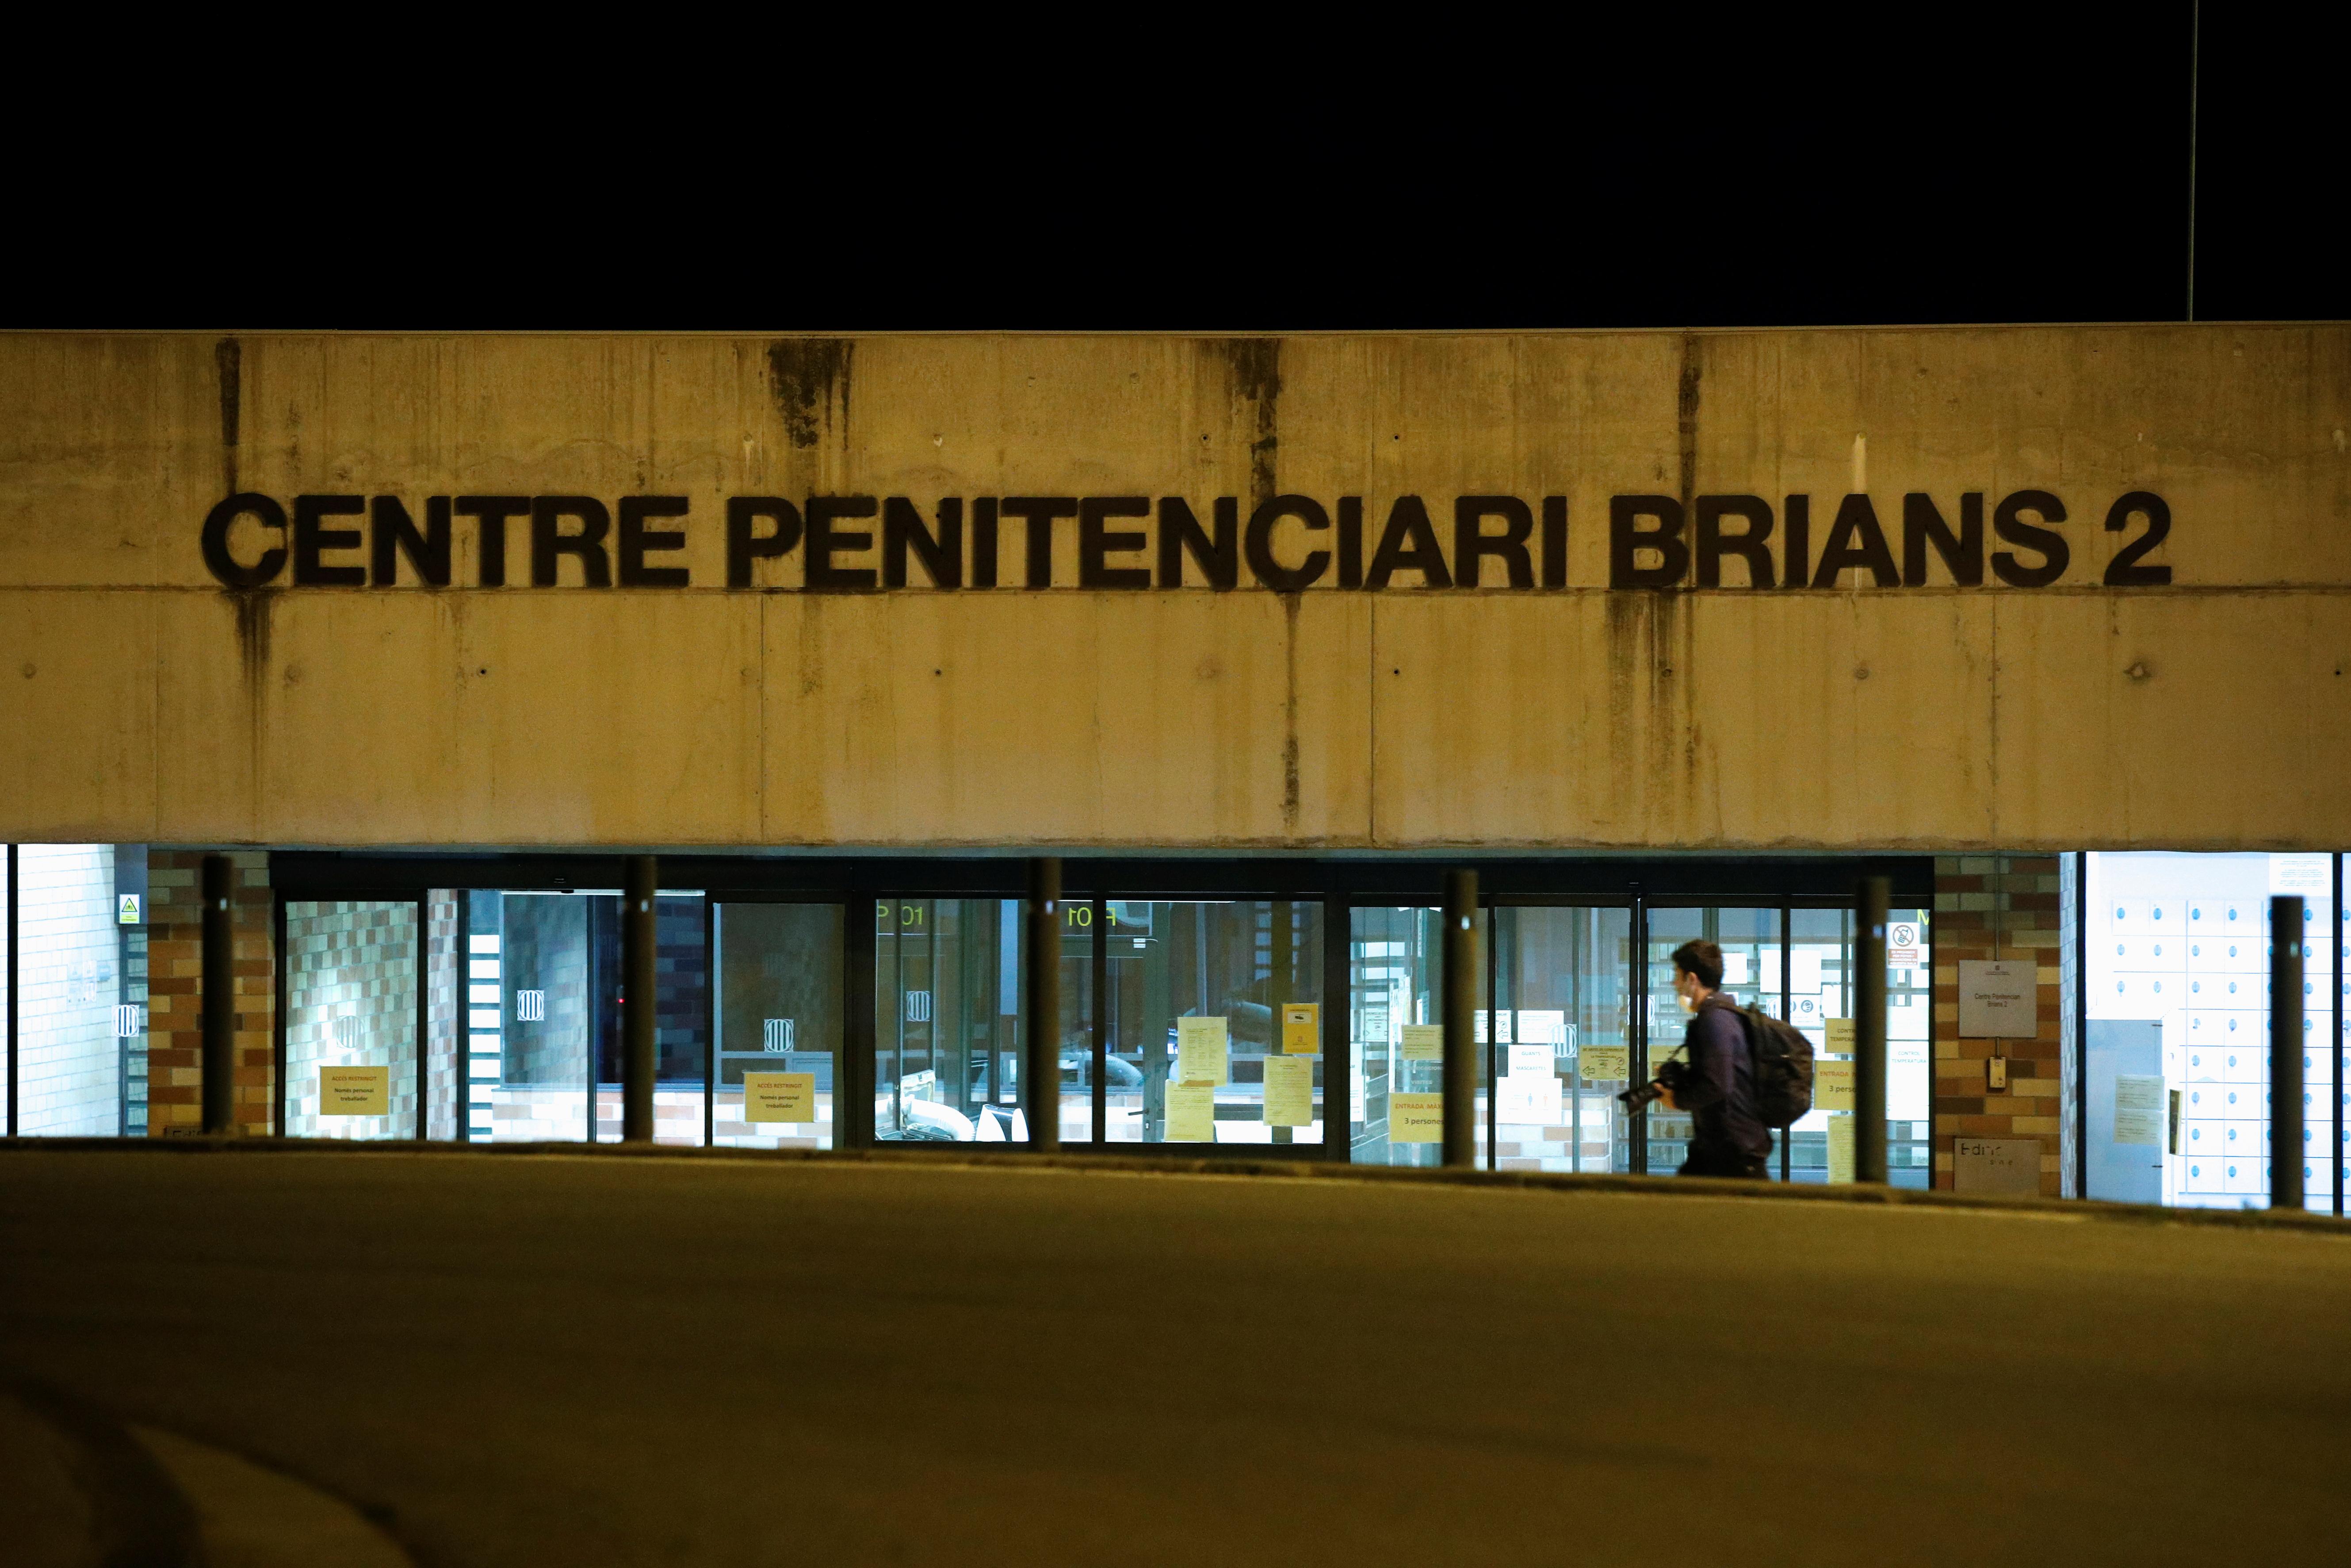 A photographer walks past the prison Brians 2 near Barcelona, Spain, June 23, 2021. REUTERS/Albert Gea